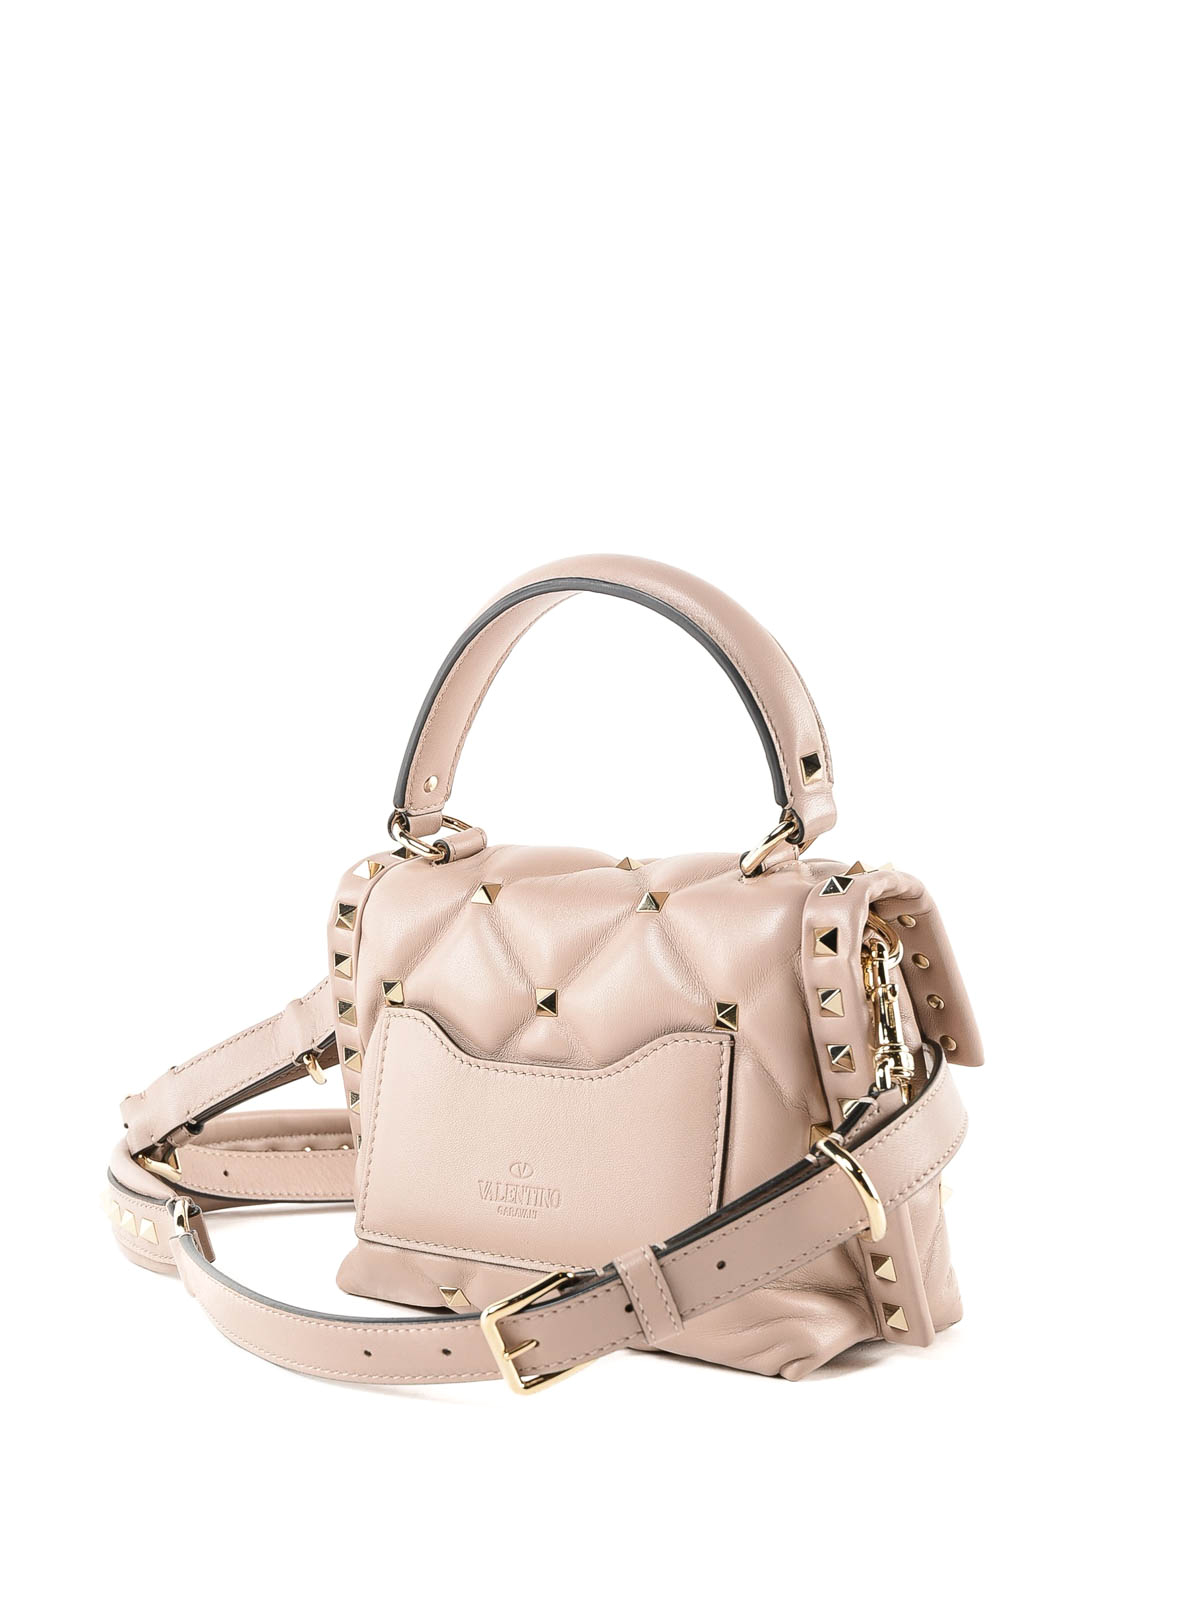 3221bfff62 iKRIX VALENTINO GARAVANI: cross body bags - Candystud quilted leather  crossbody bag